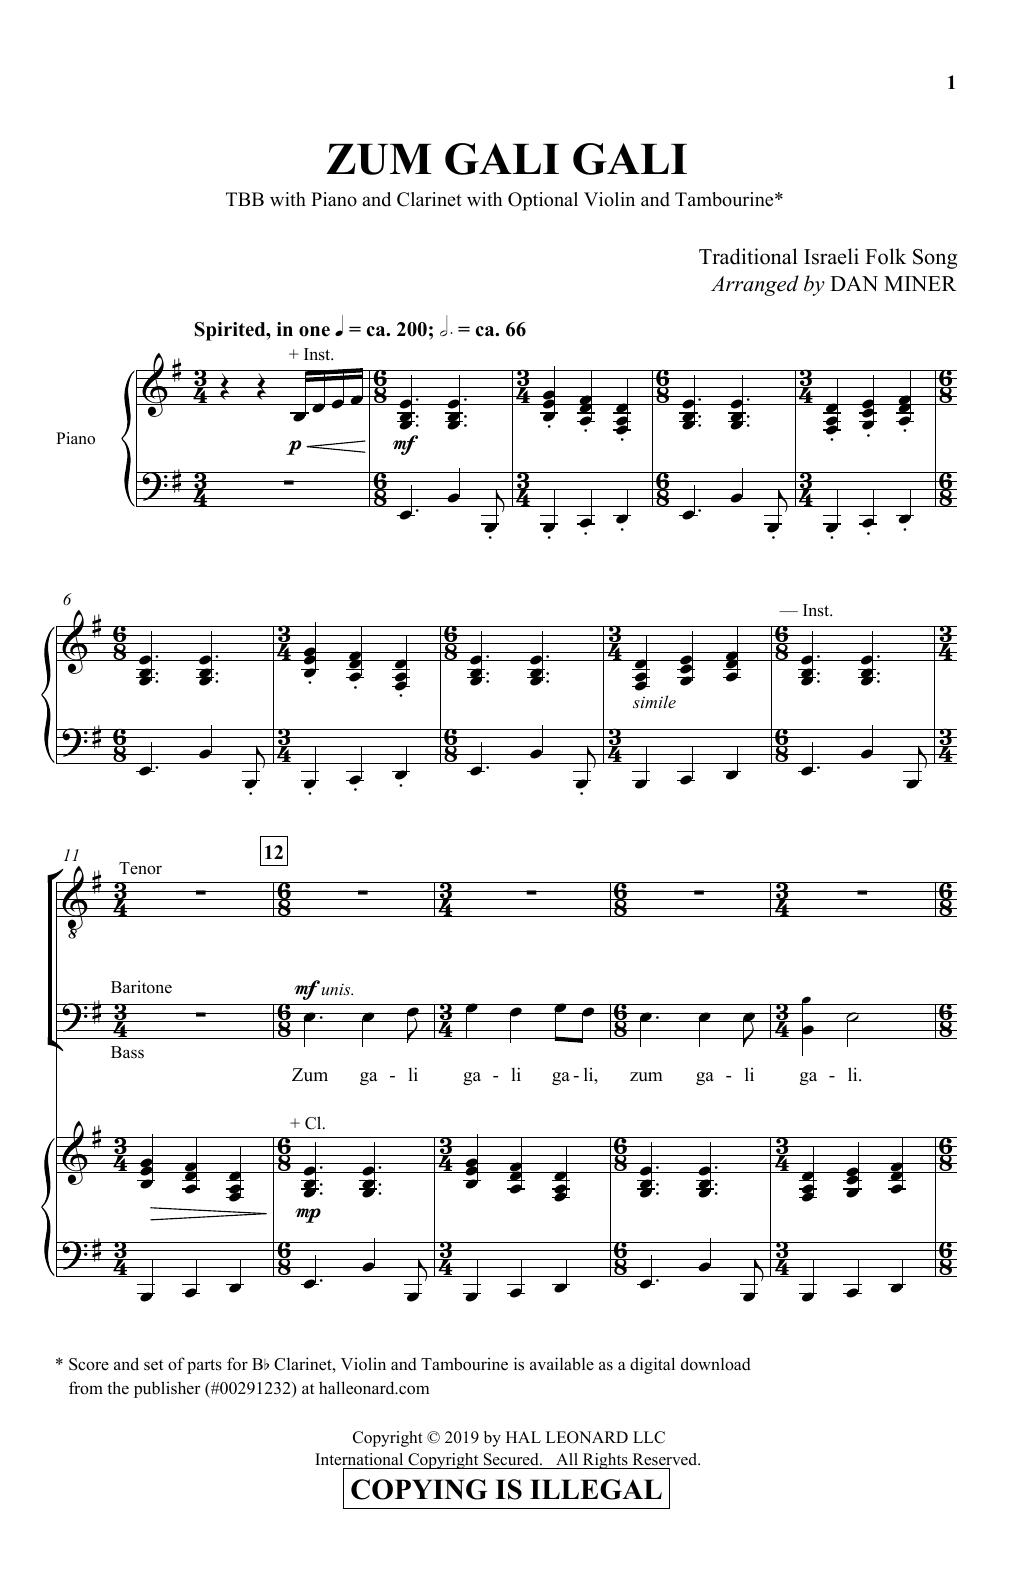 Download Dan Miner 'Zum Gali Gali' Digital Sheet Music Notes & Chords and start playing in minutes